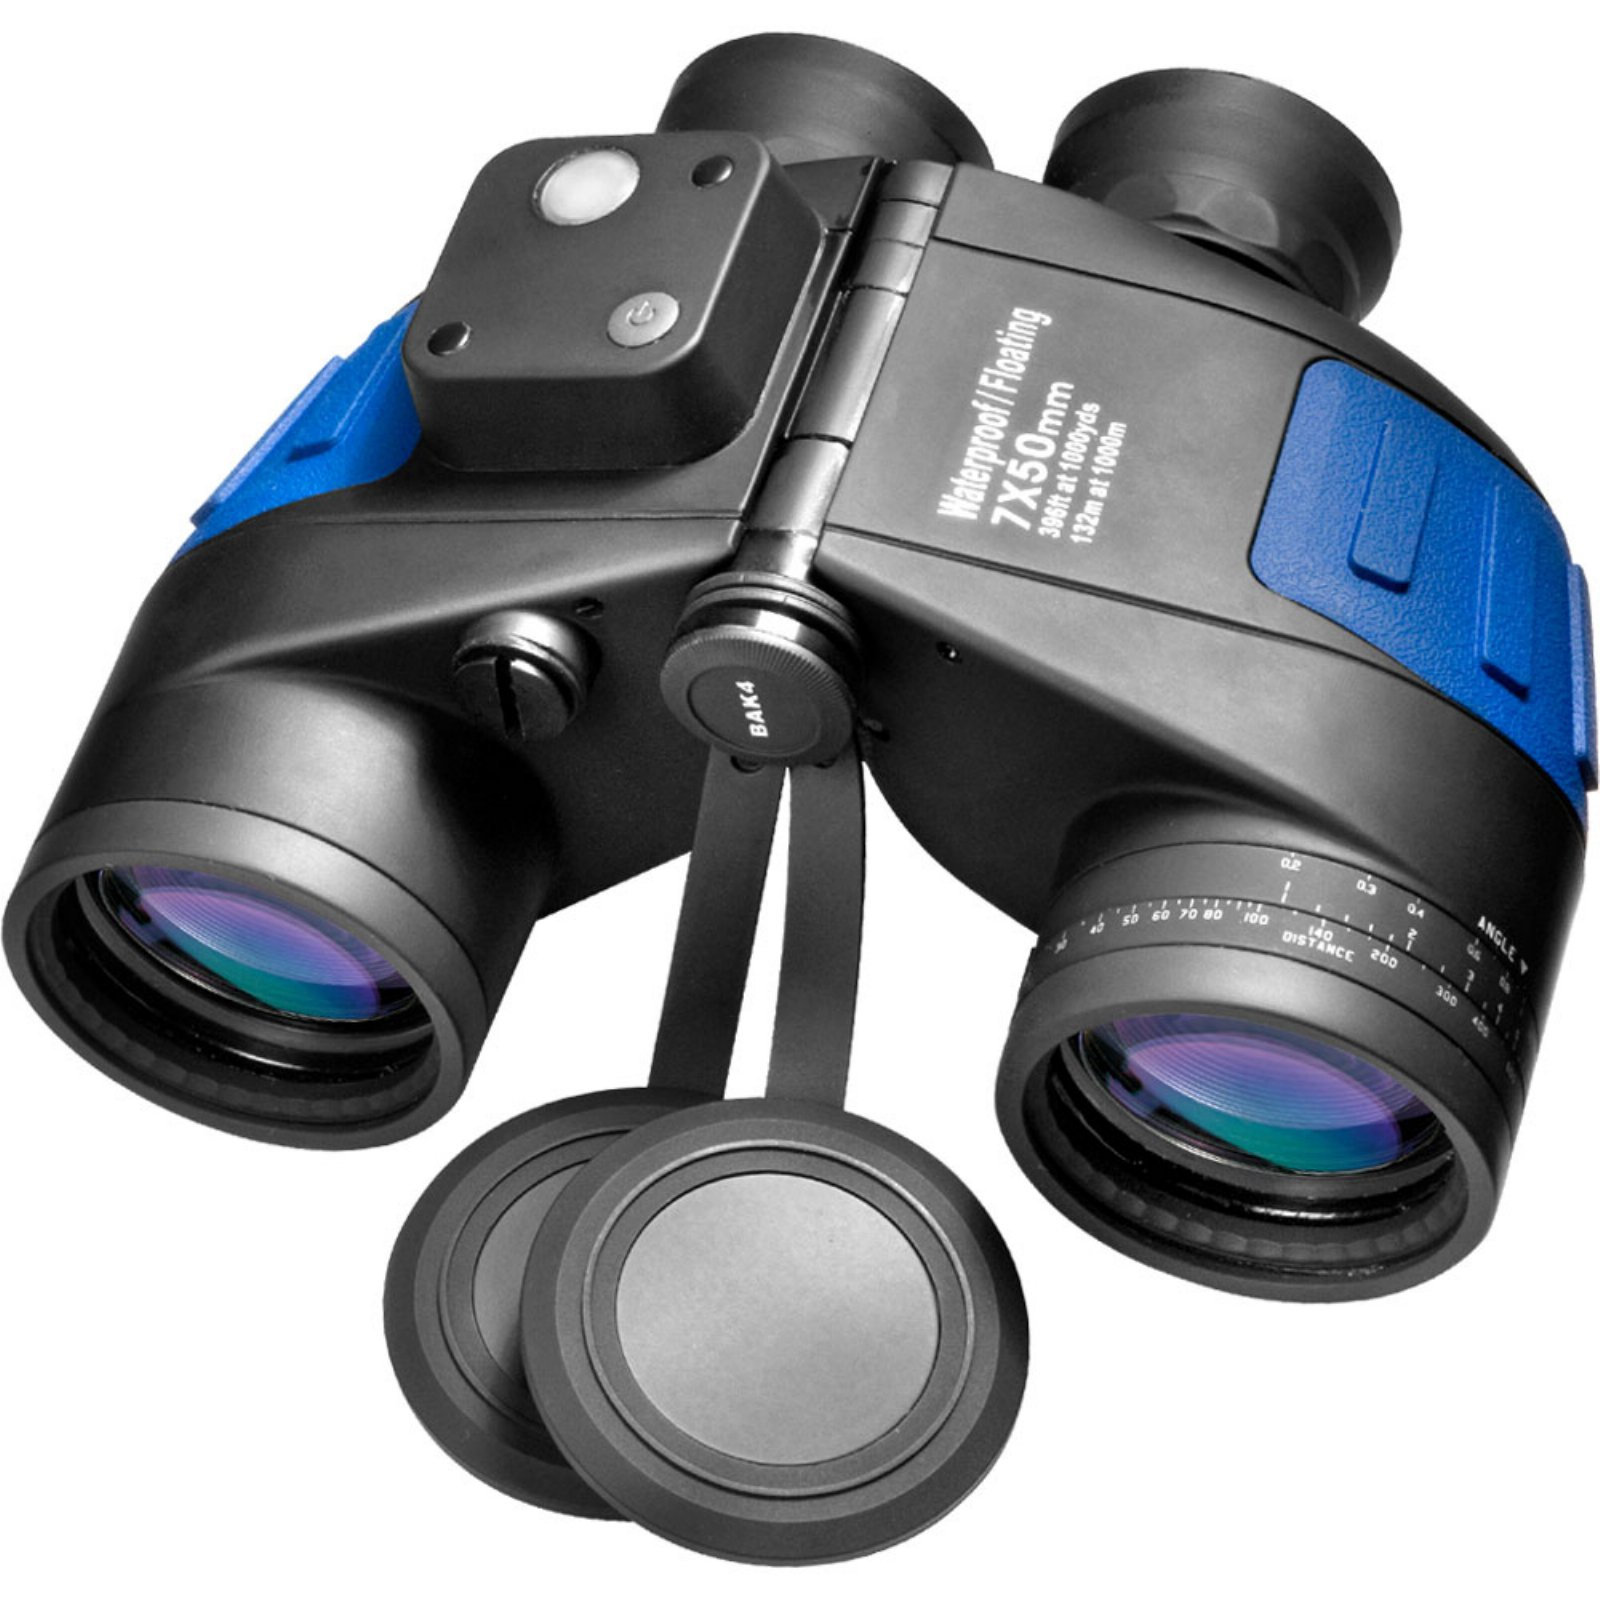 Barska 7x50mm Waterproof Floating Binocular with Compass and Rangefinder Reticle by Barska